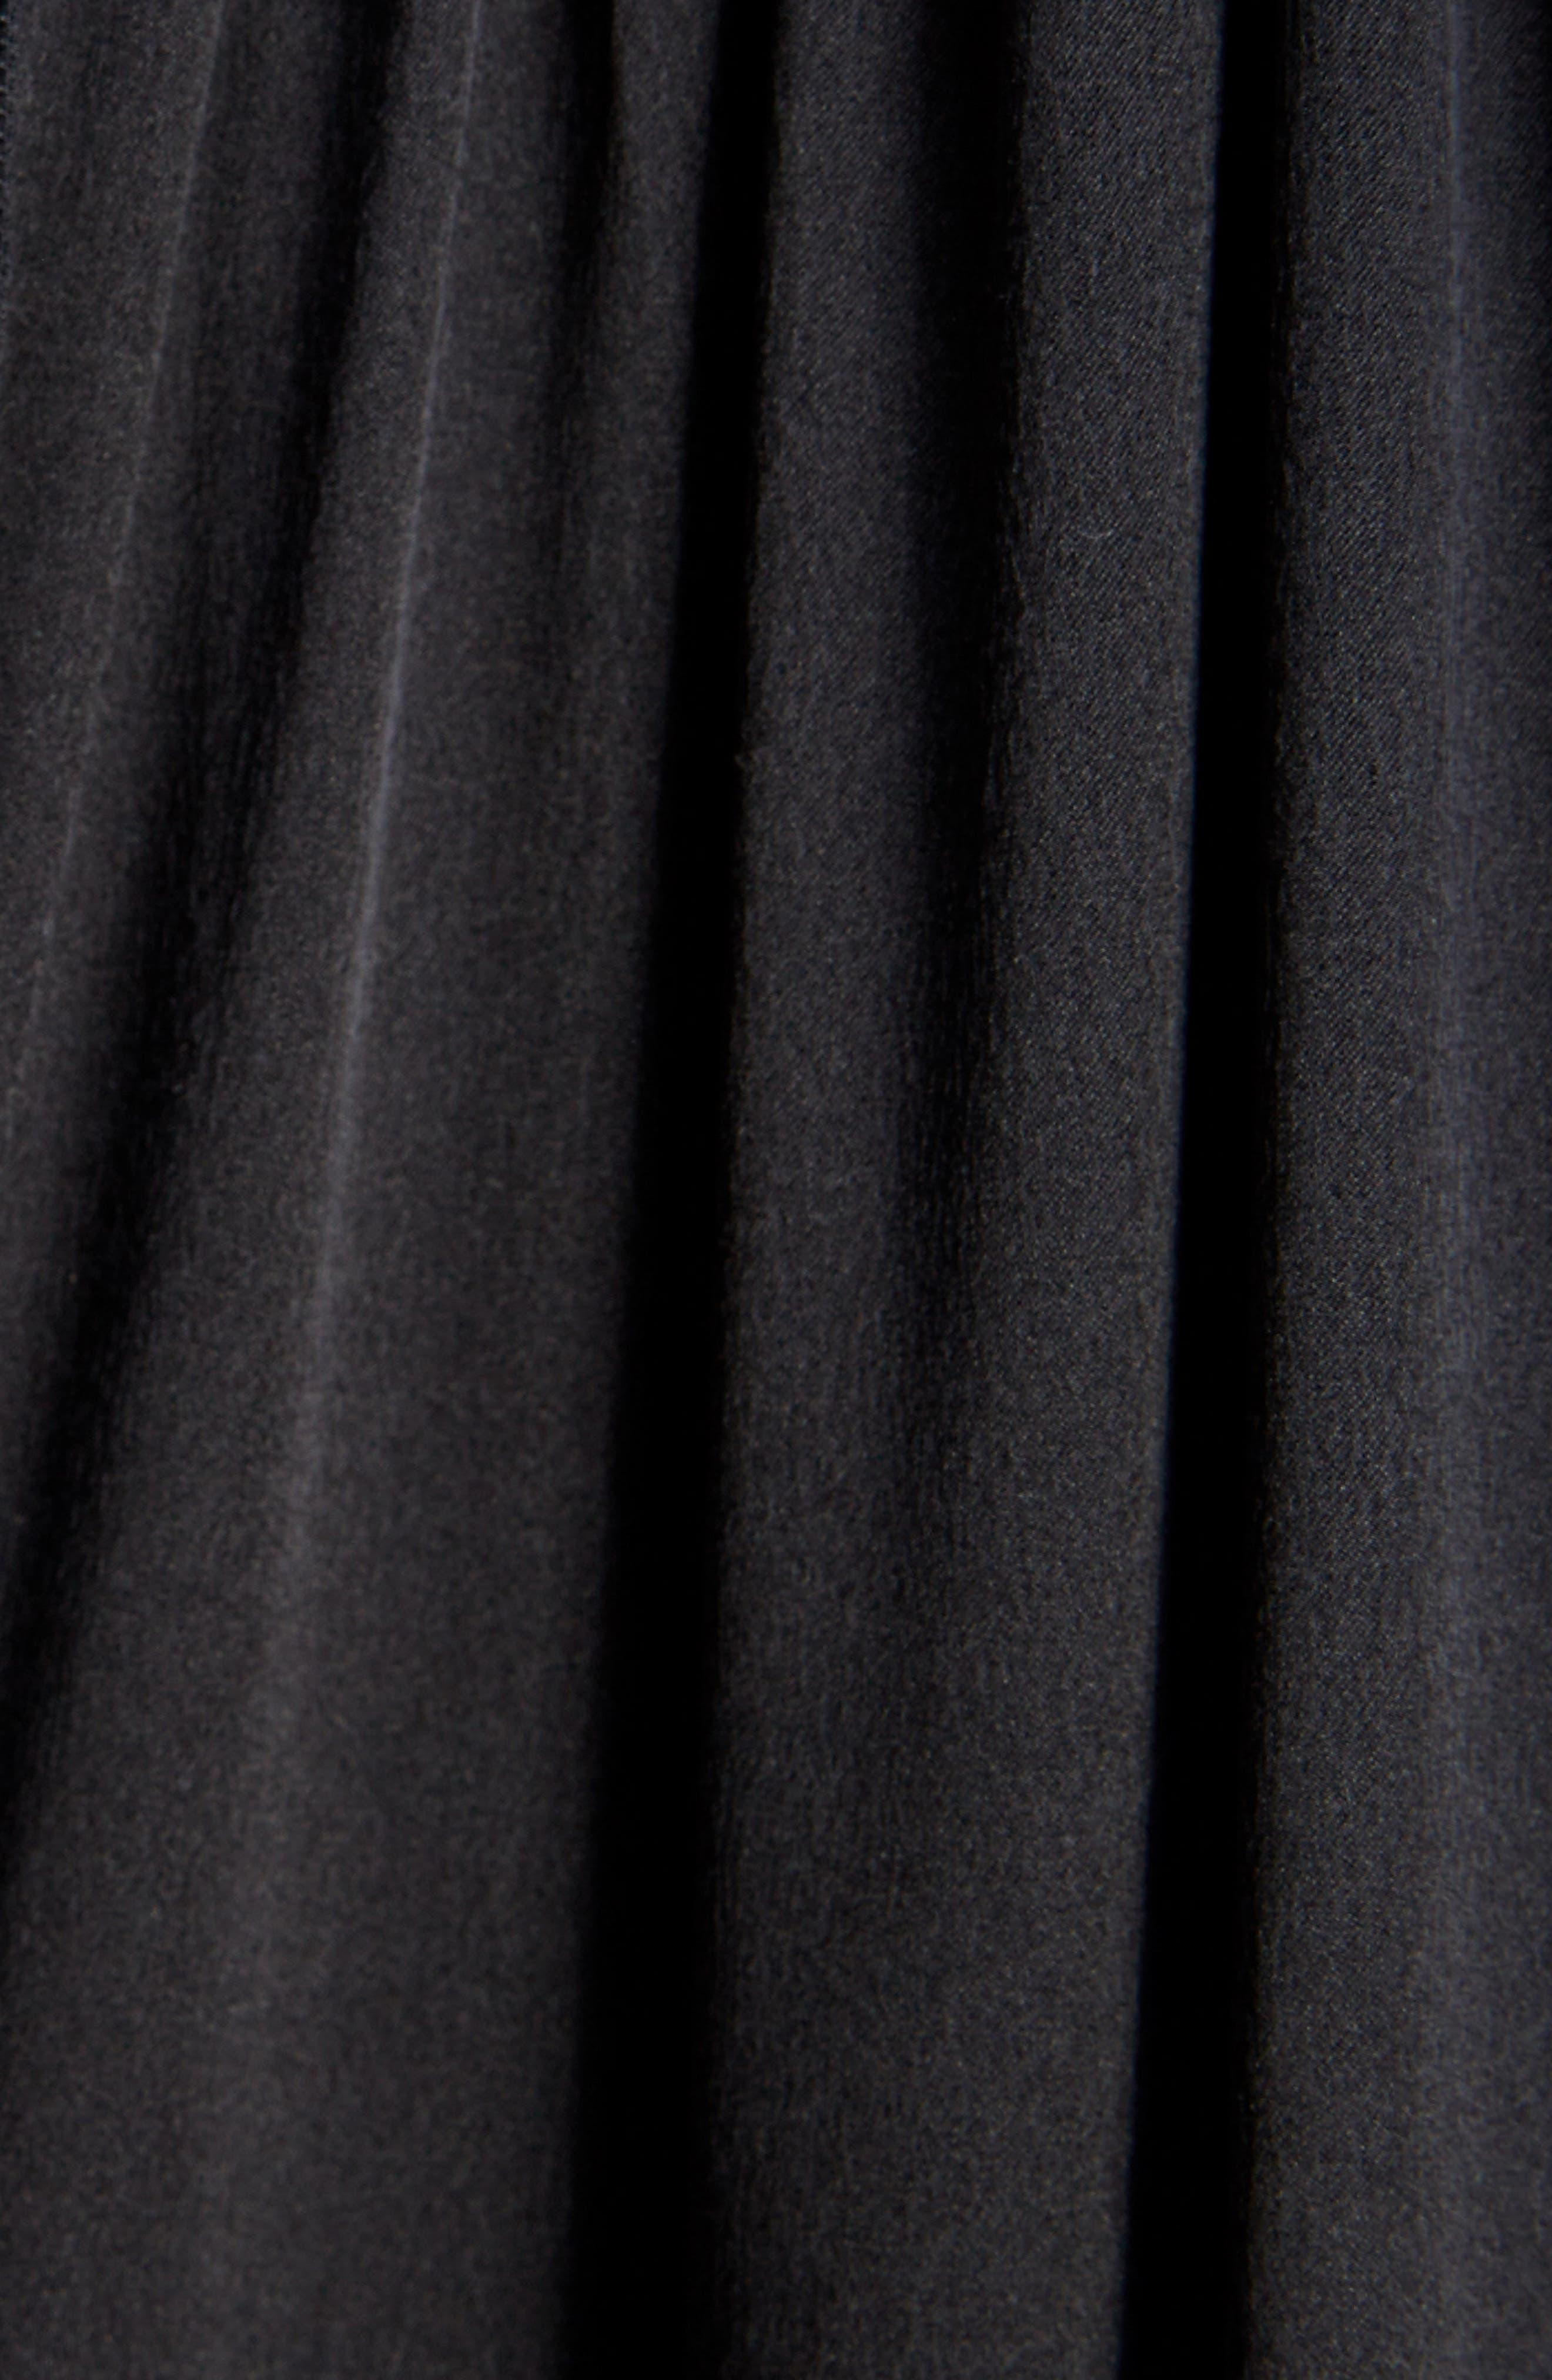 Frill Patchwork Dress,                             Alternate thumbnail 5, color,                             Black Multi